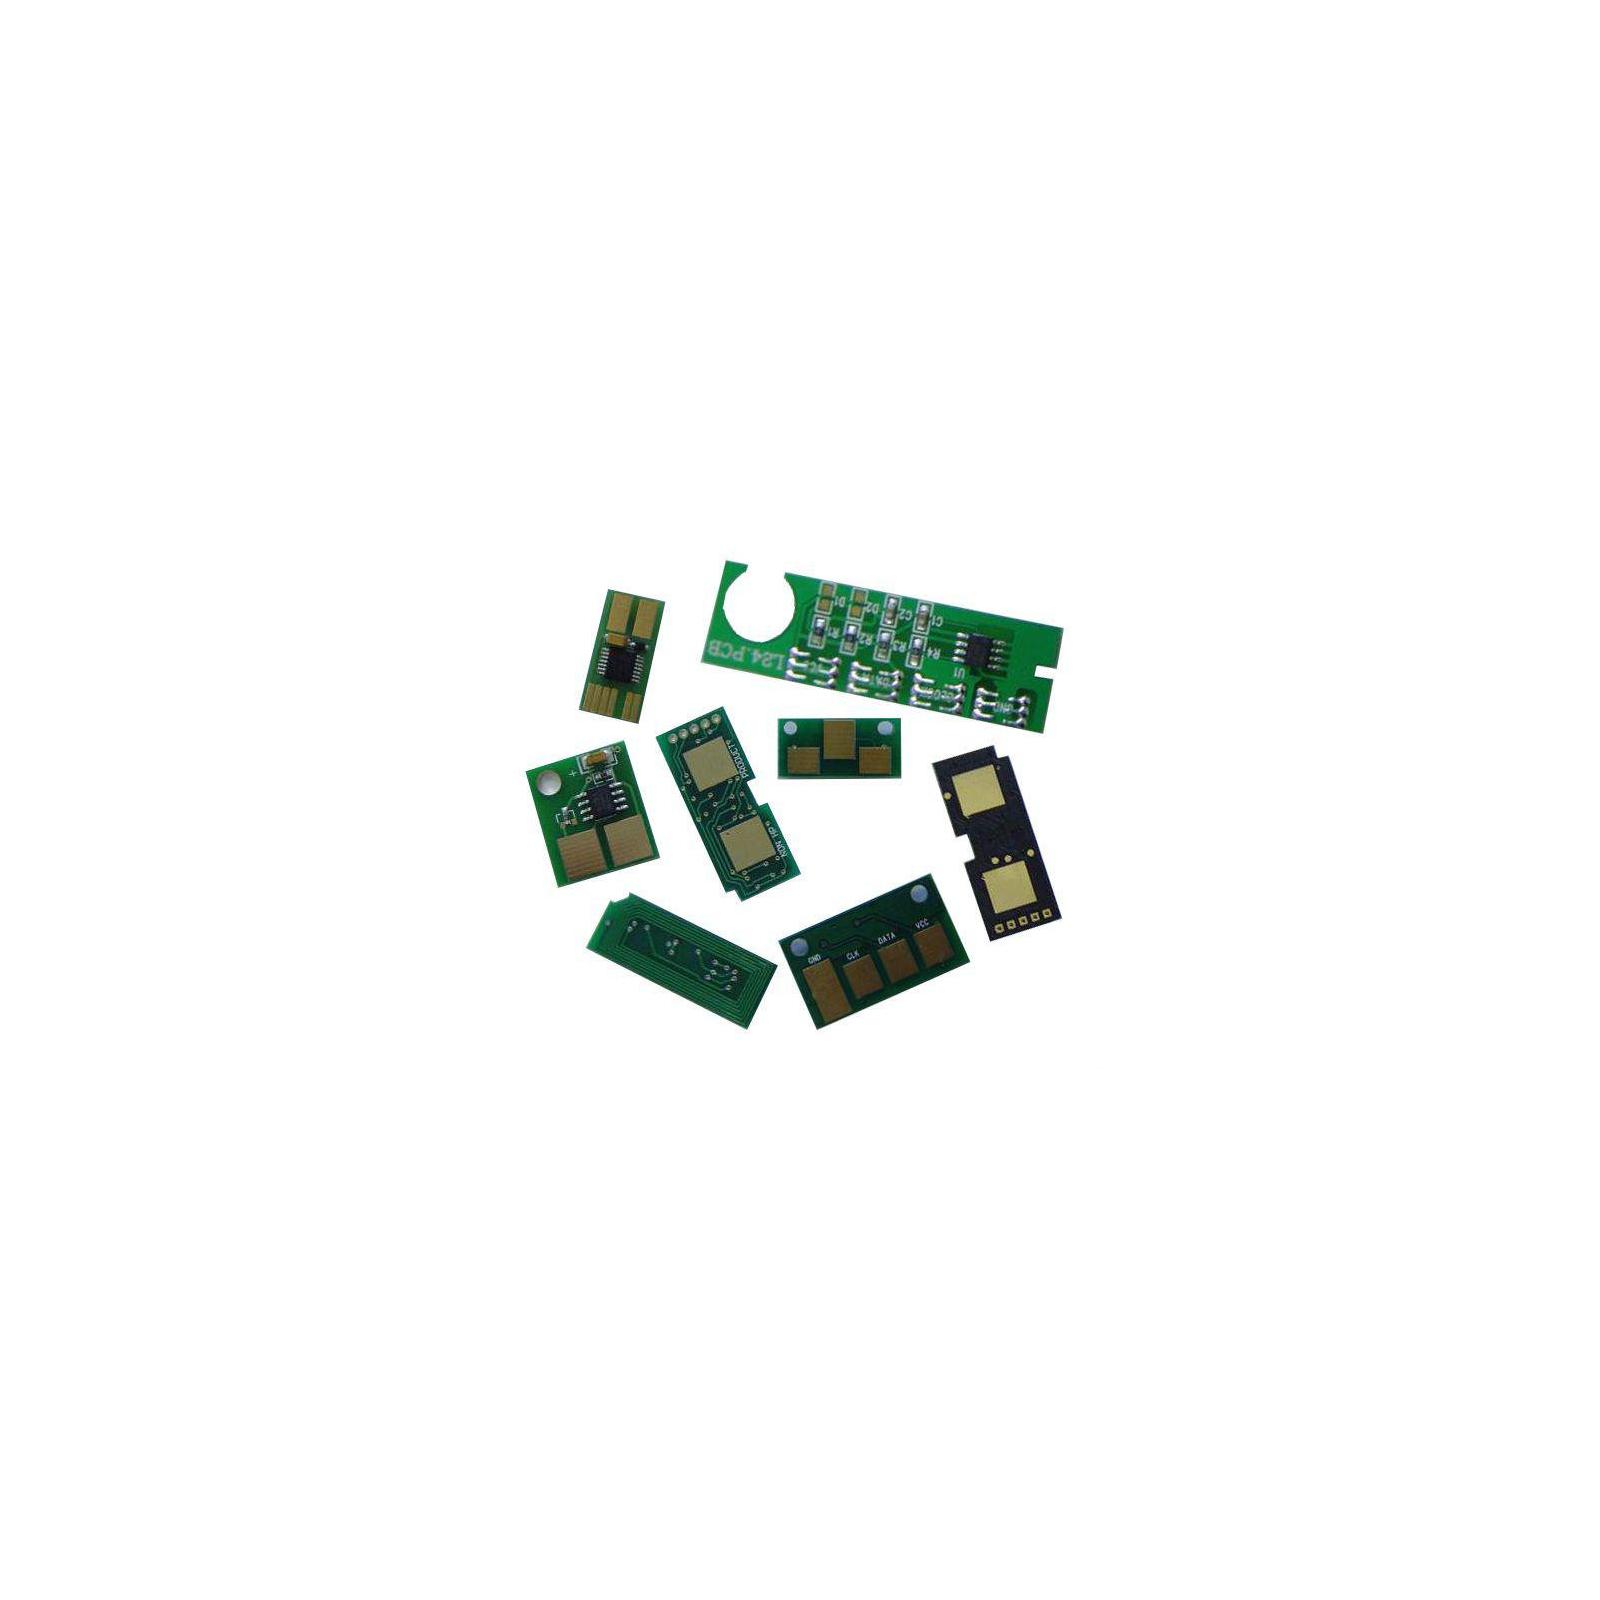 Чип для картриджа EPSON T0805 ДЛЯ R265/P50 LIGHT MAGENTA Apex (CHIP-EPS-T0806-LM)